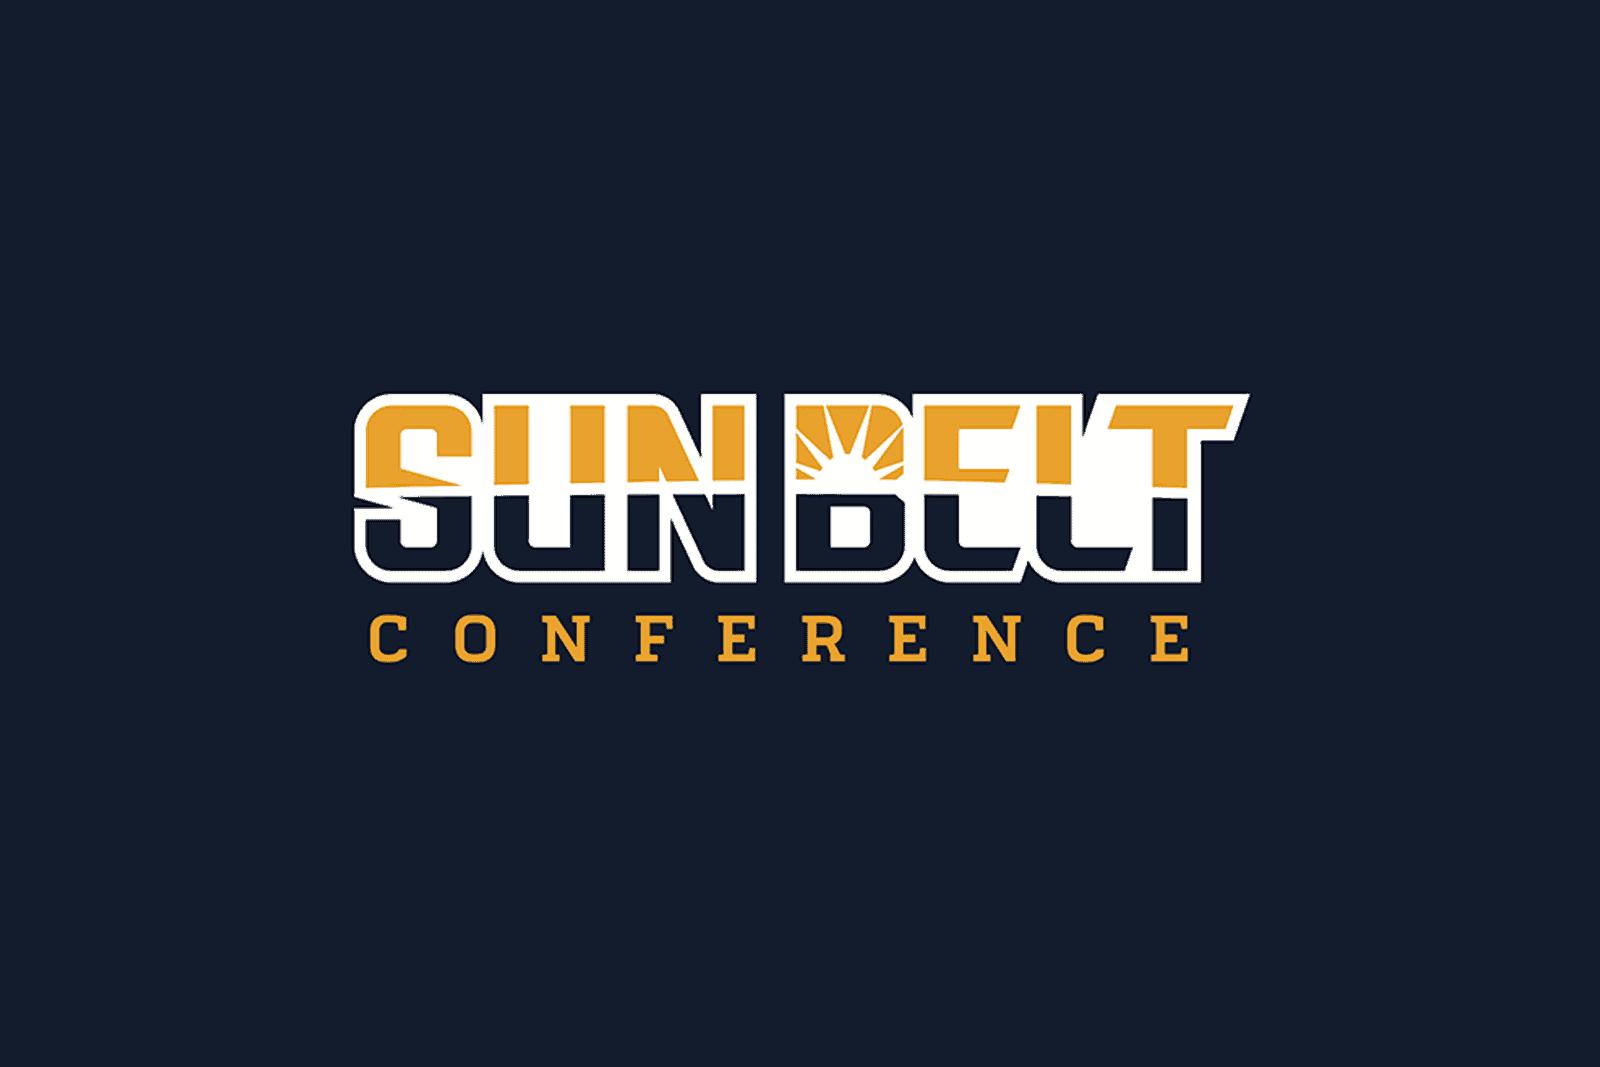 Sun Belt early season 2021 football TV schedule